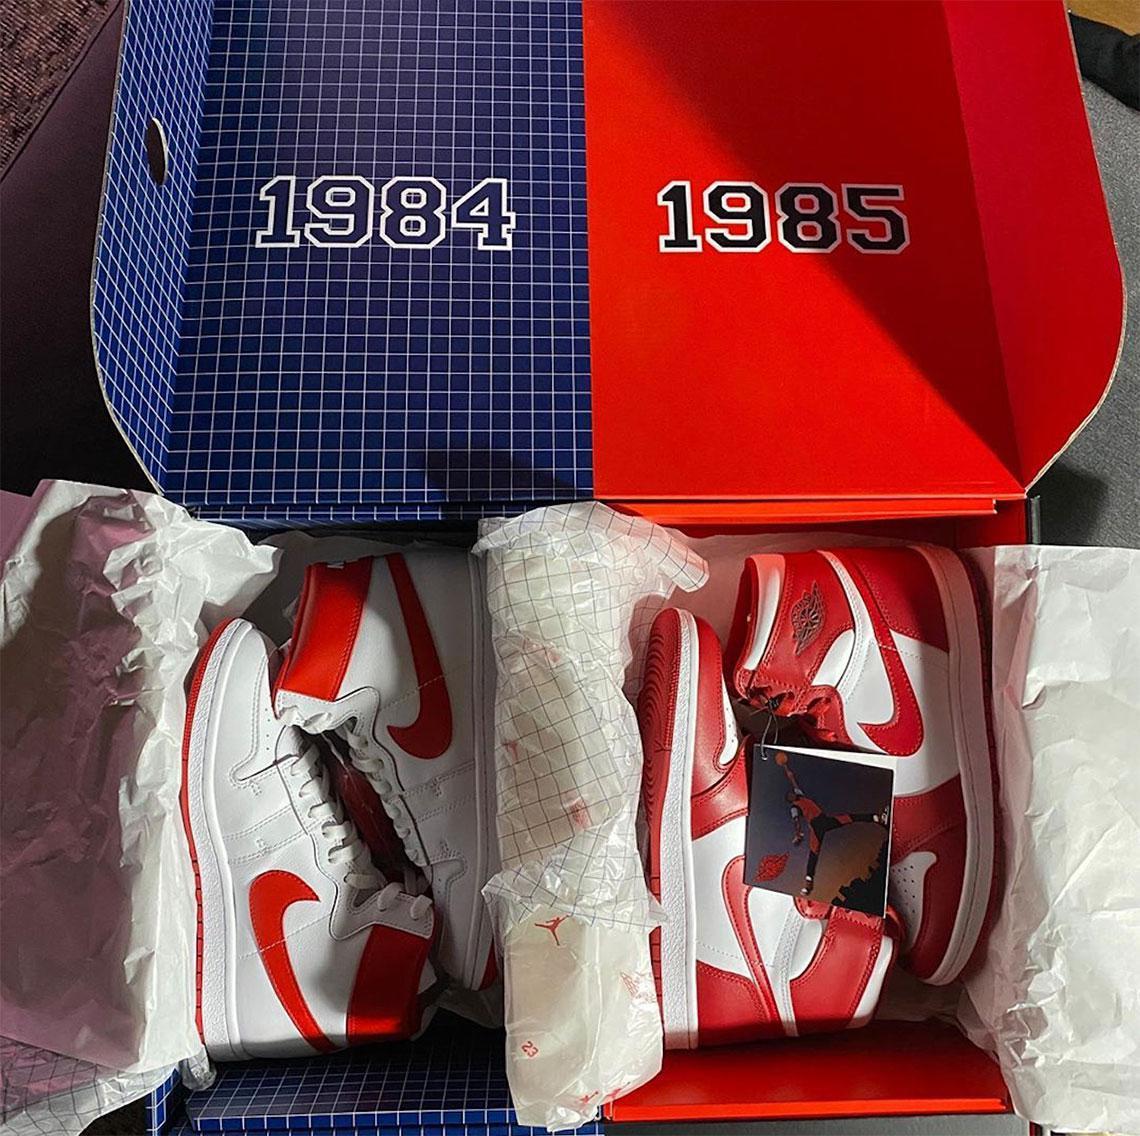 LA Nike Air Ship PE de Michael Jordan sortira en même temps que la Air Jordan 1 dans l'Epic Two-Pair Pack